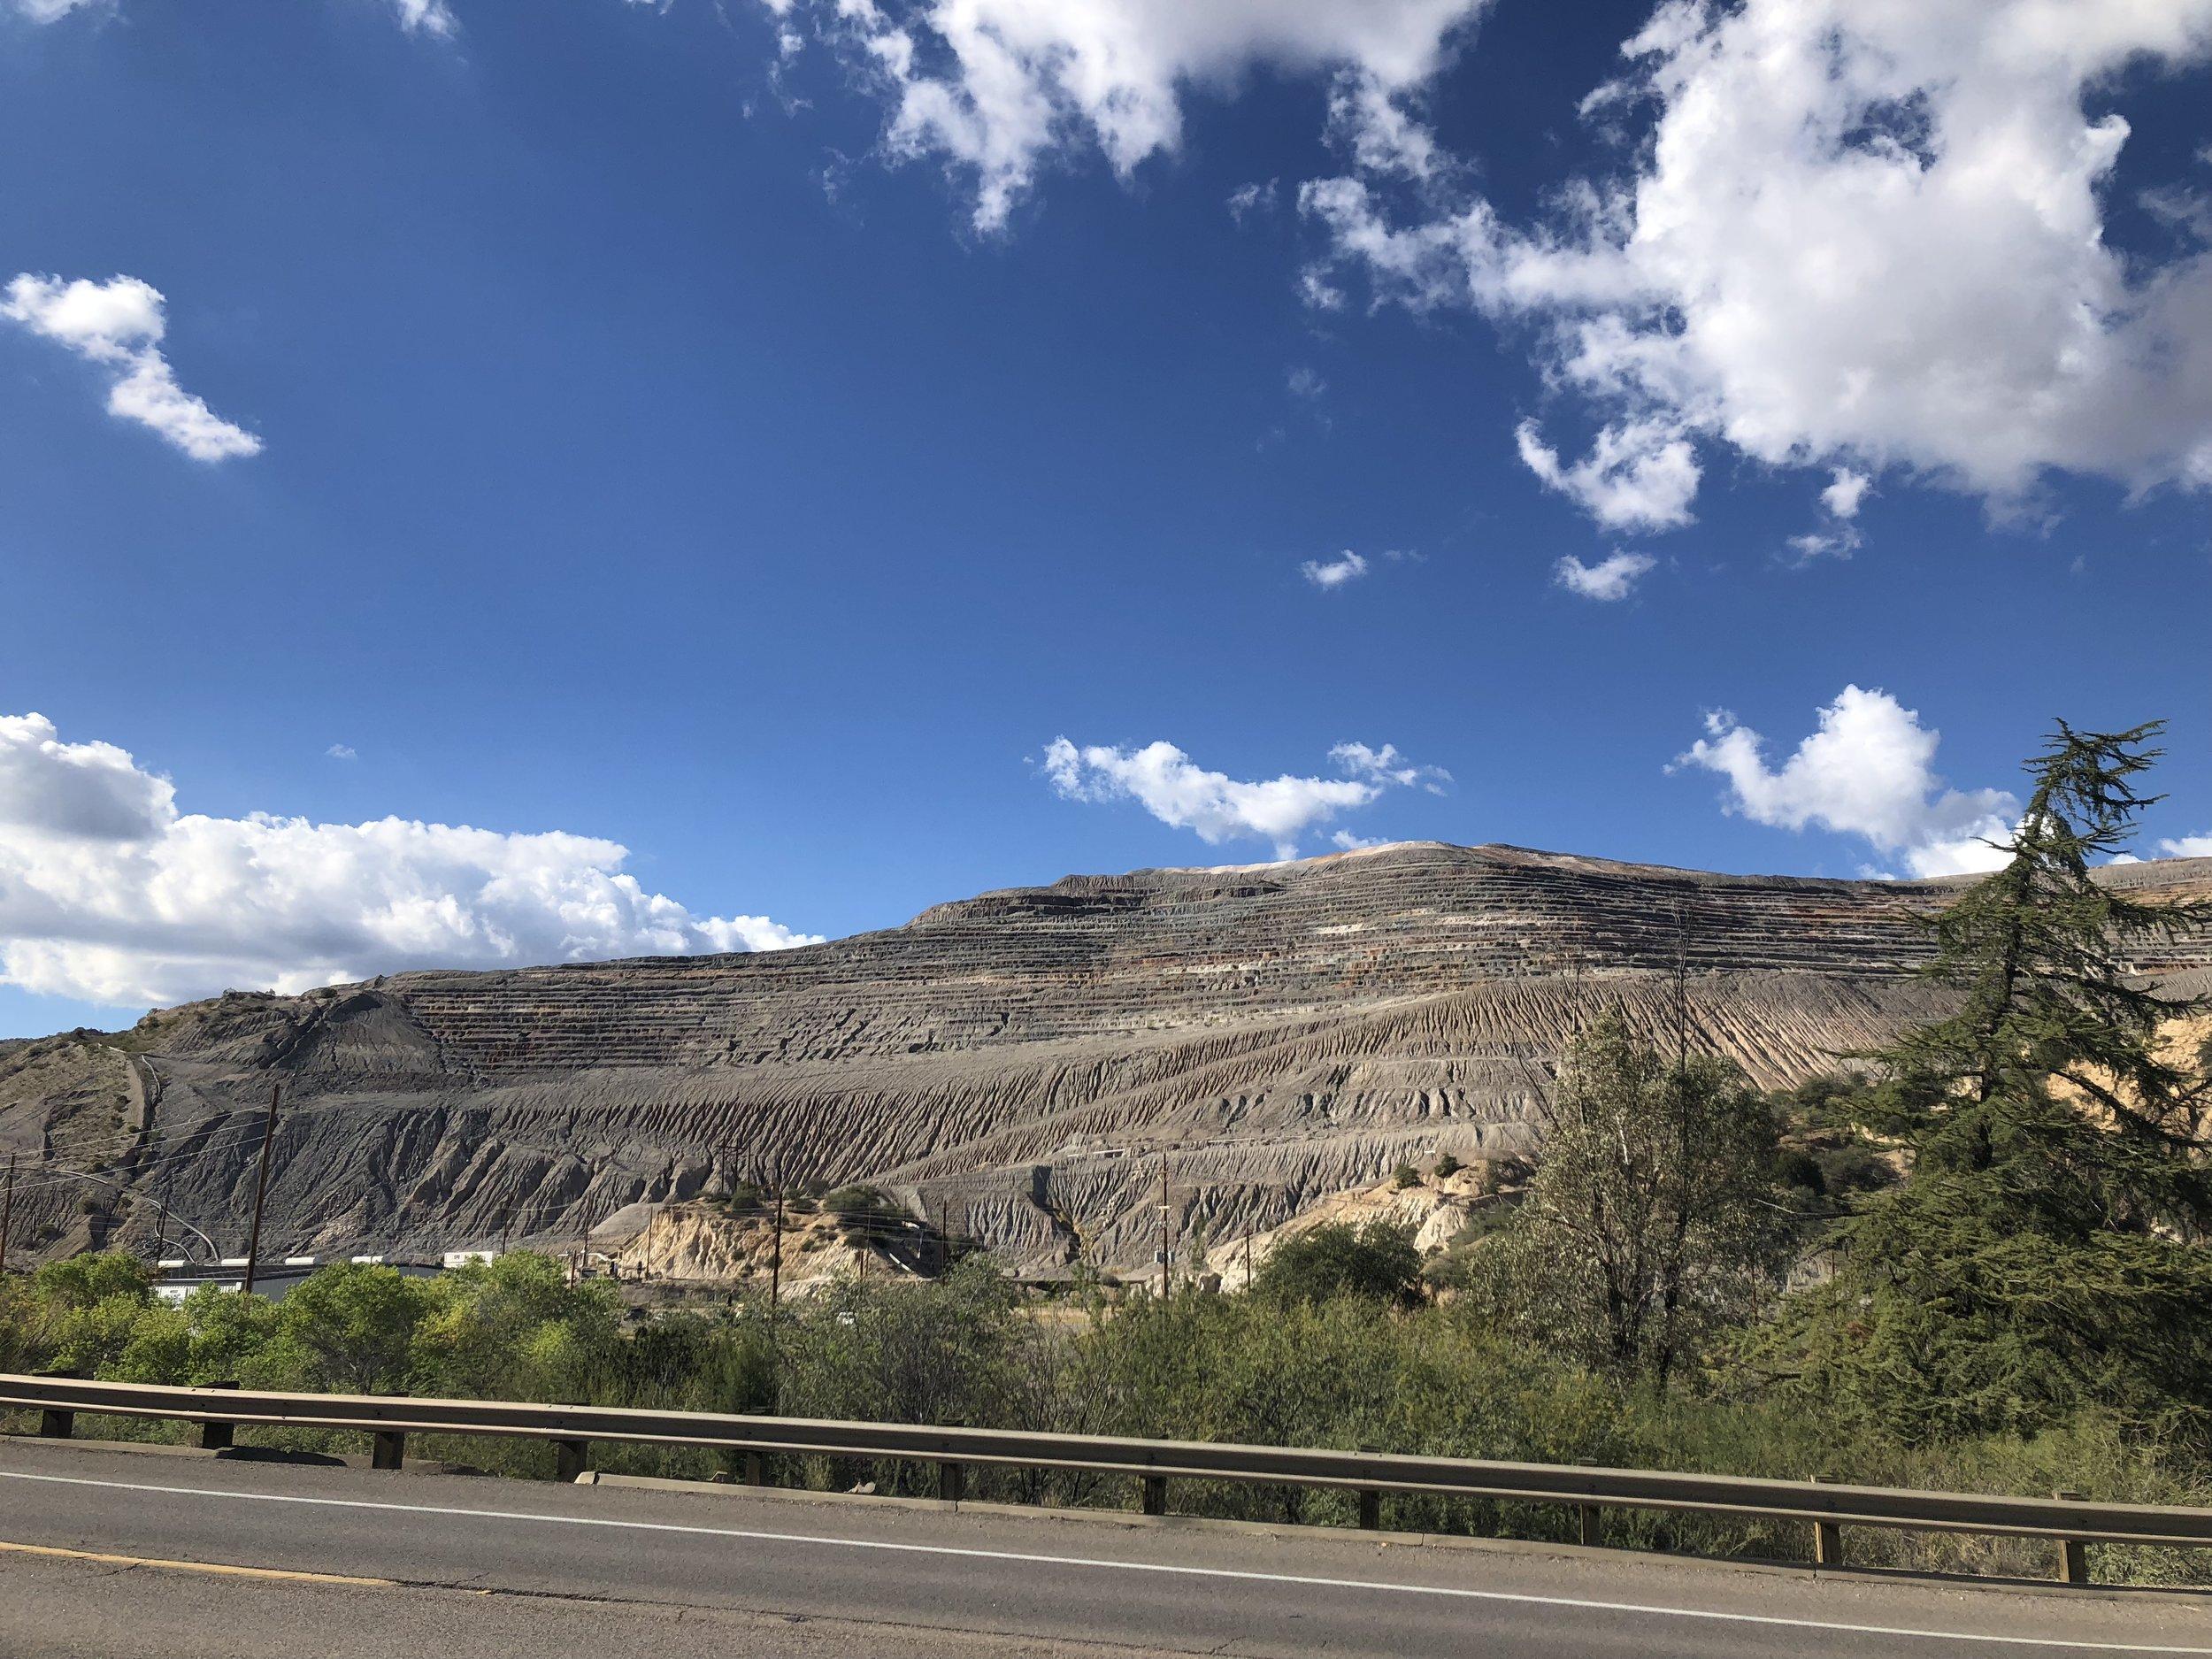 A copper mine we past.